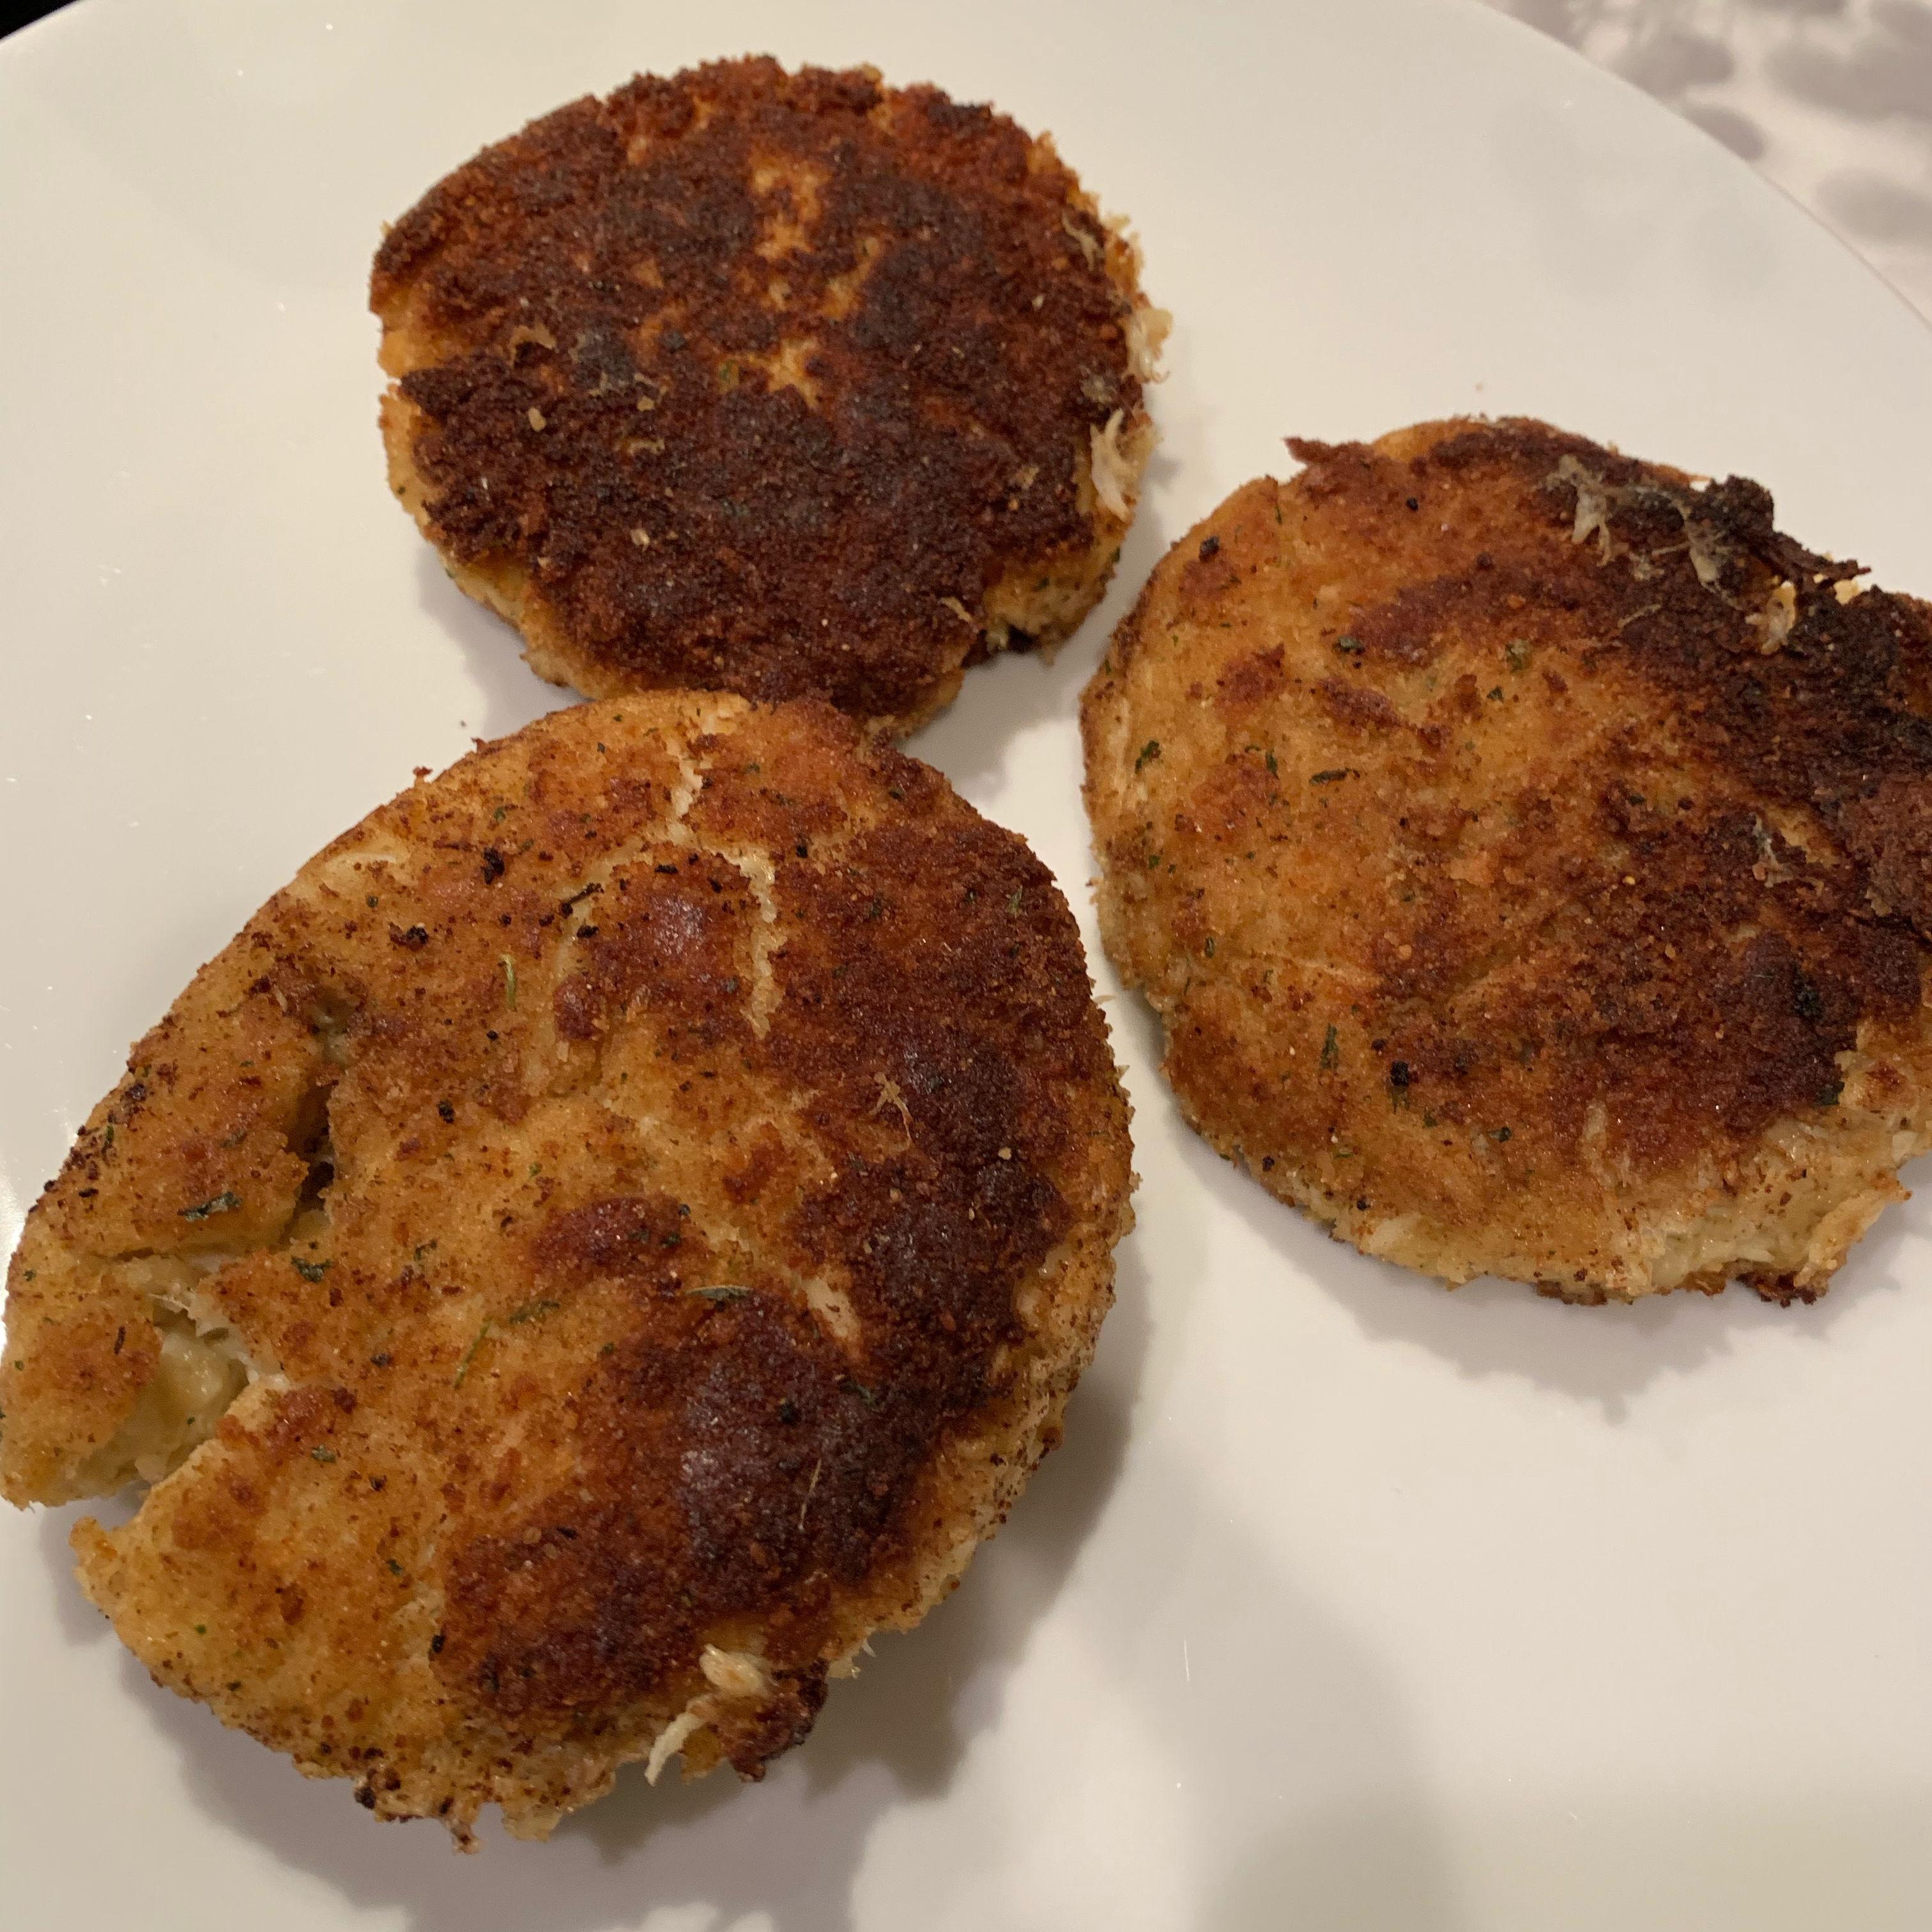 Chef John's Crab Cakes